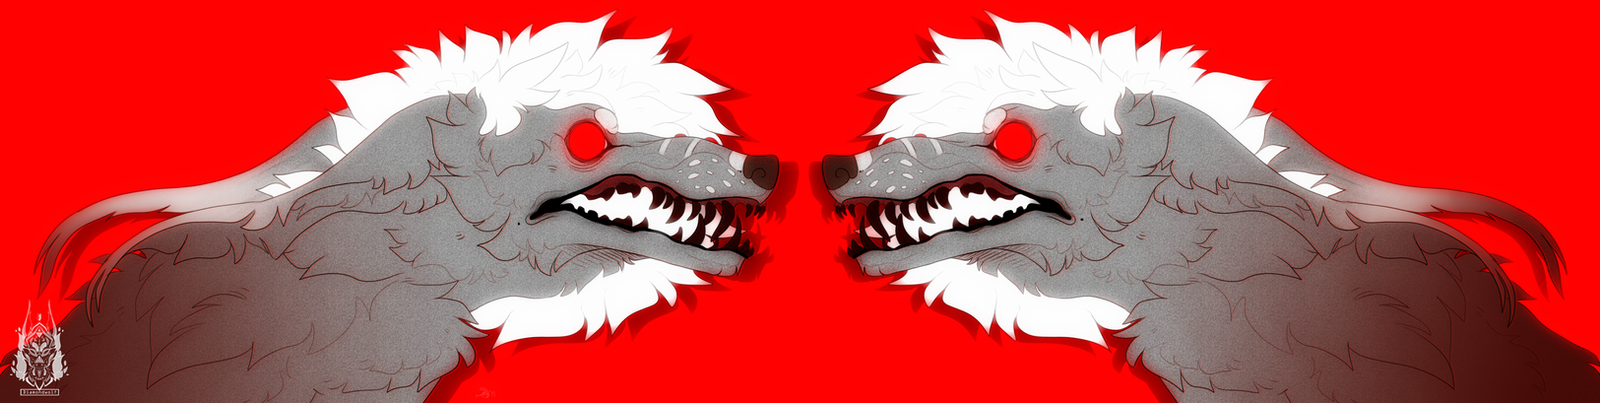 RED by DiamondwolfART